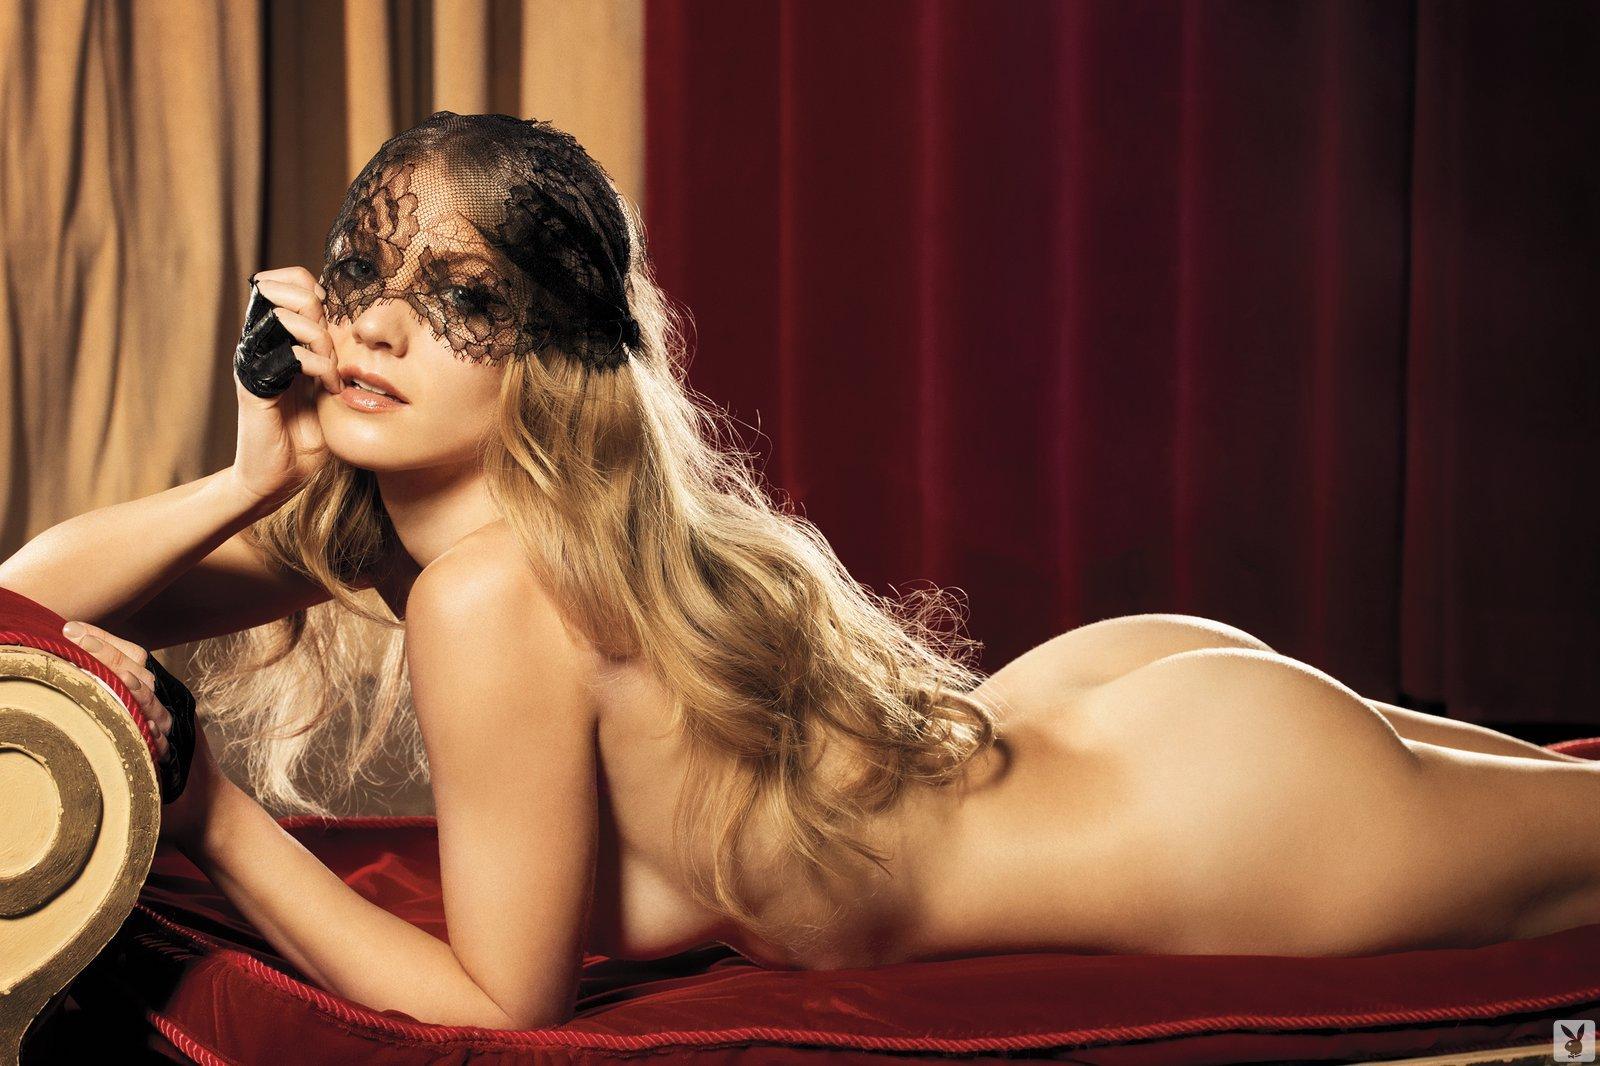 Winter Ave Zoli, Nude On Playboy Plus (12)